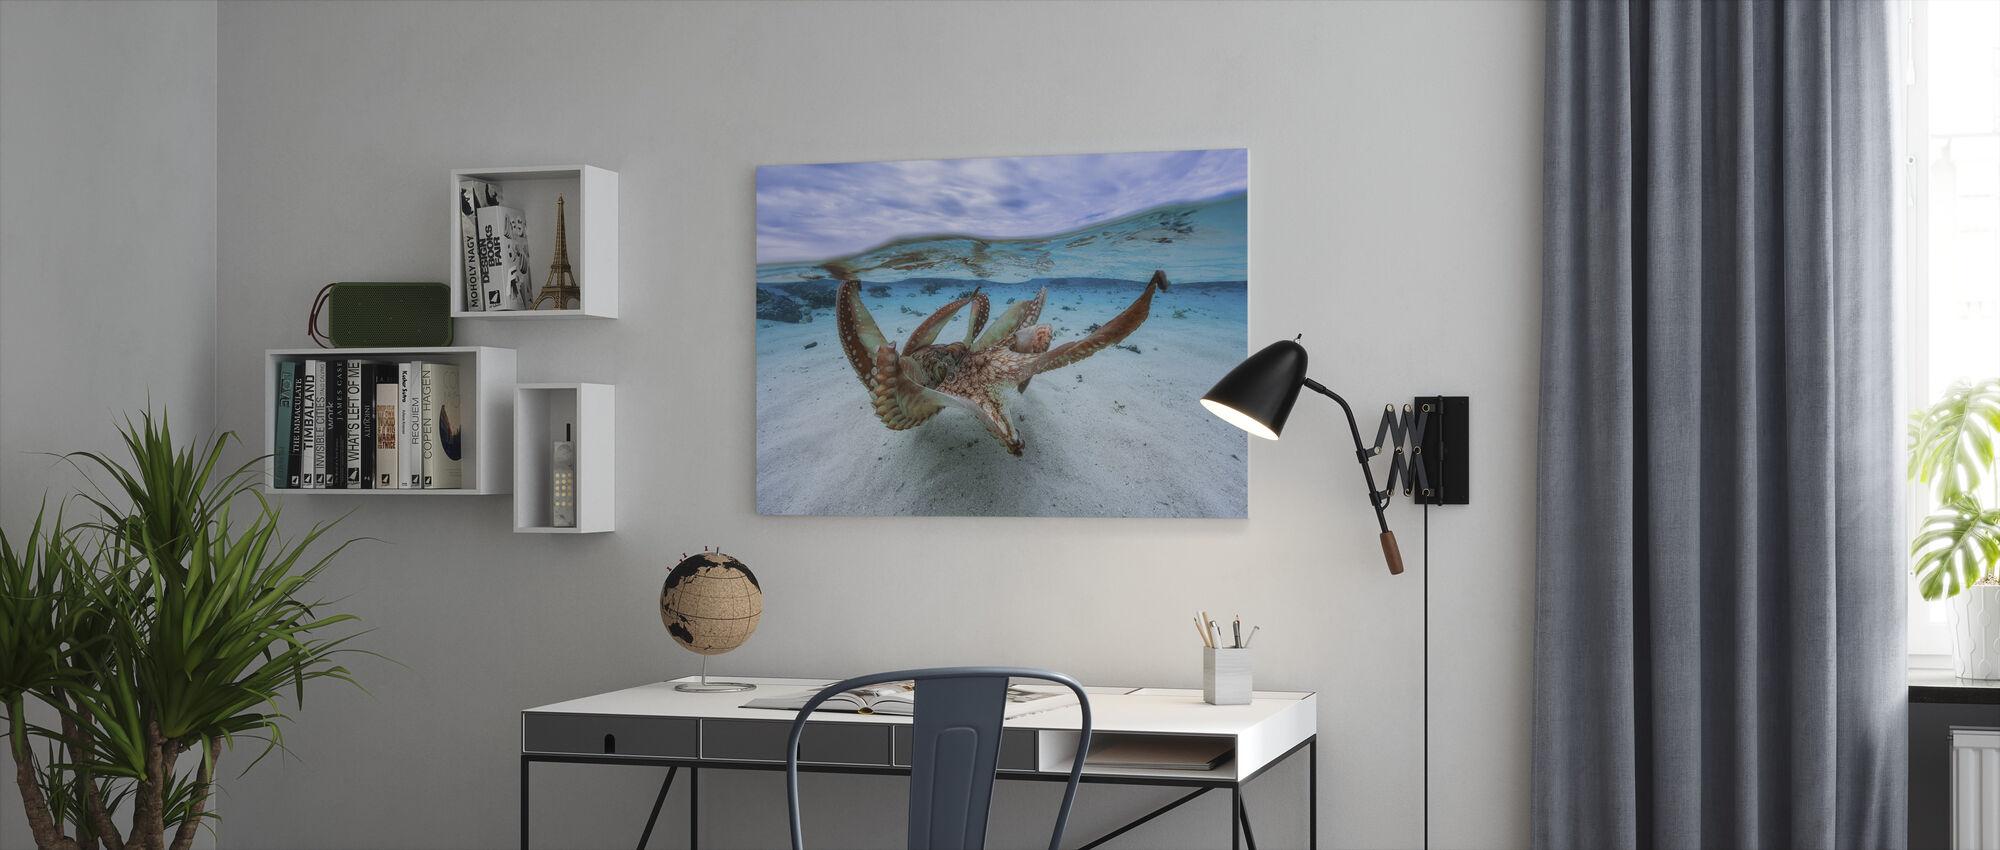 Octopus - Canvas print - Kantoor